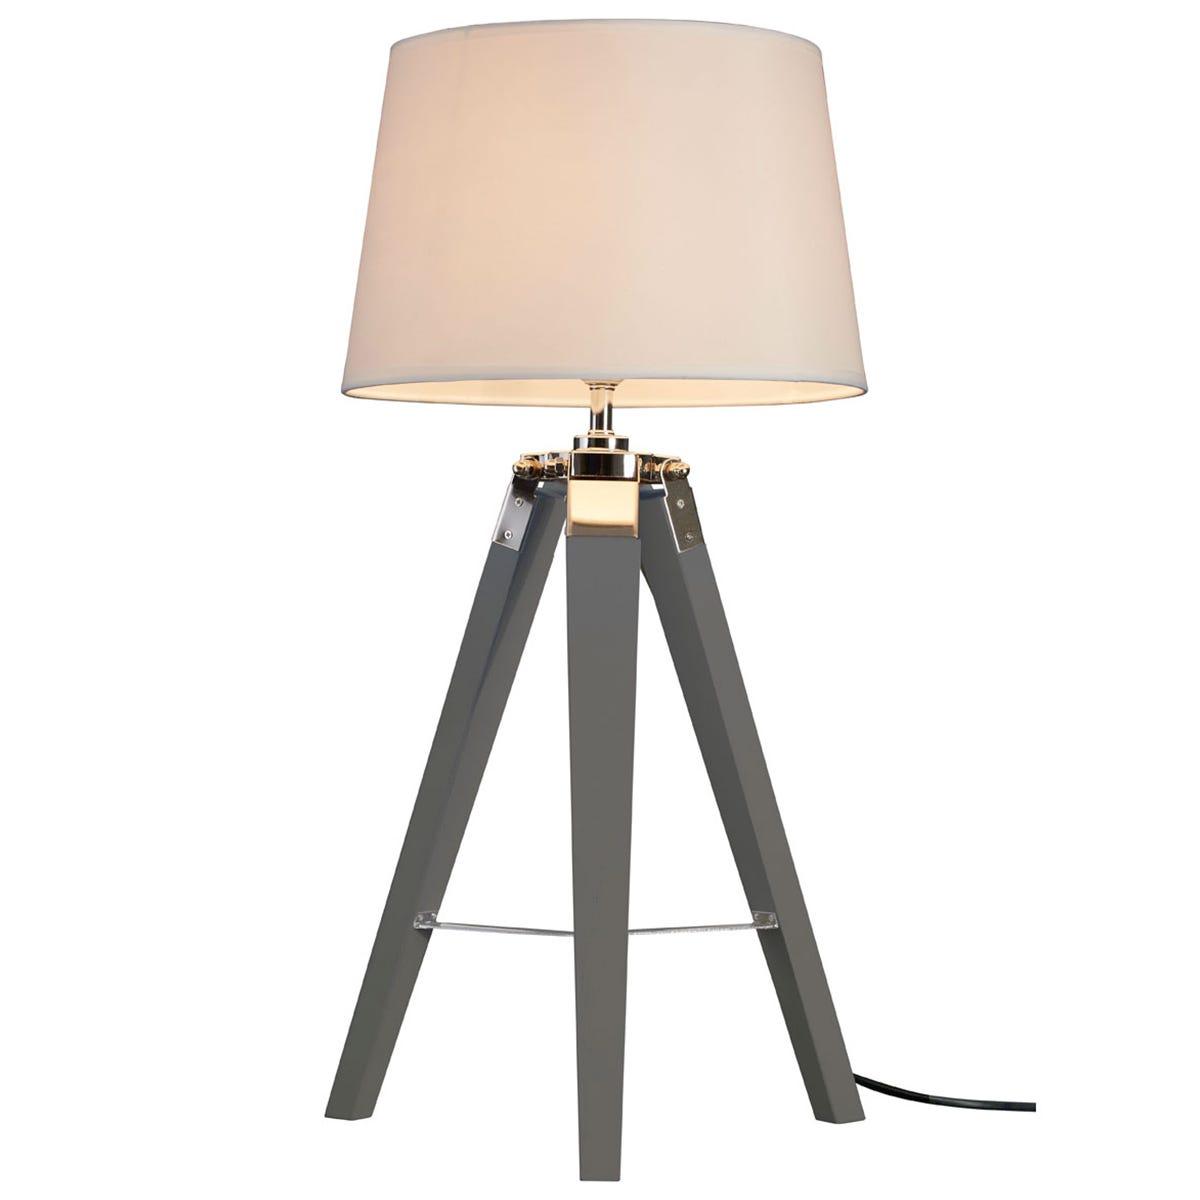 Premier Housewares Bailey Table Lamp Grey / Tripod